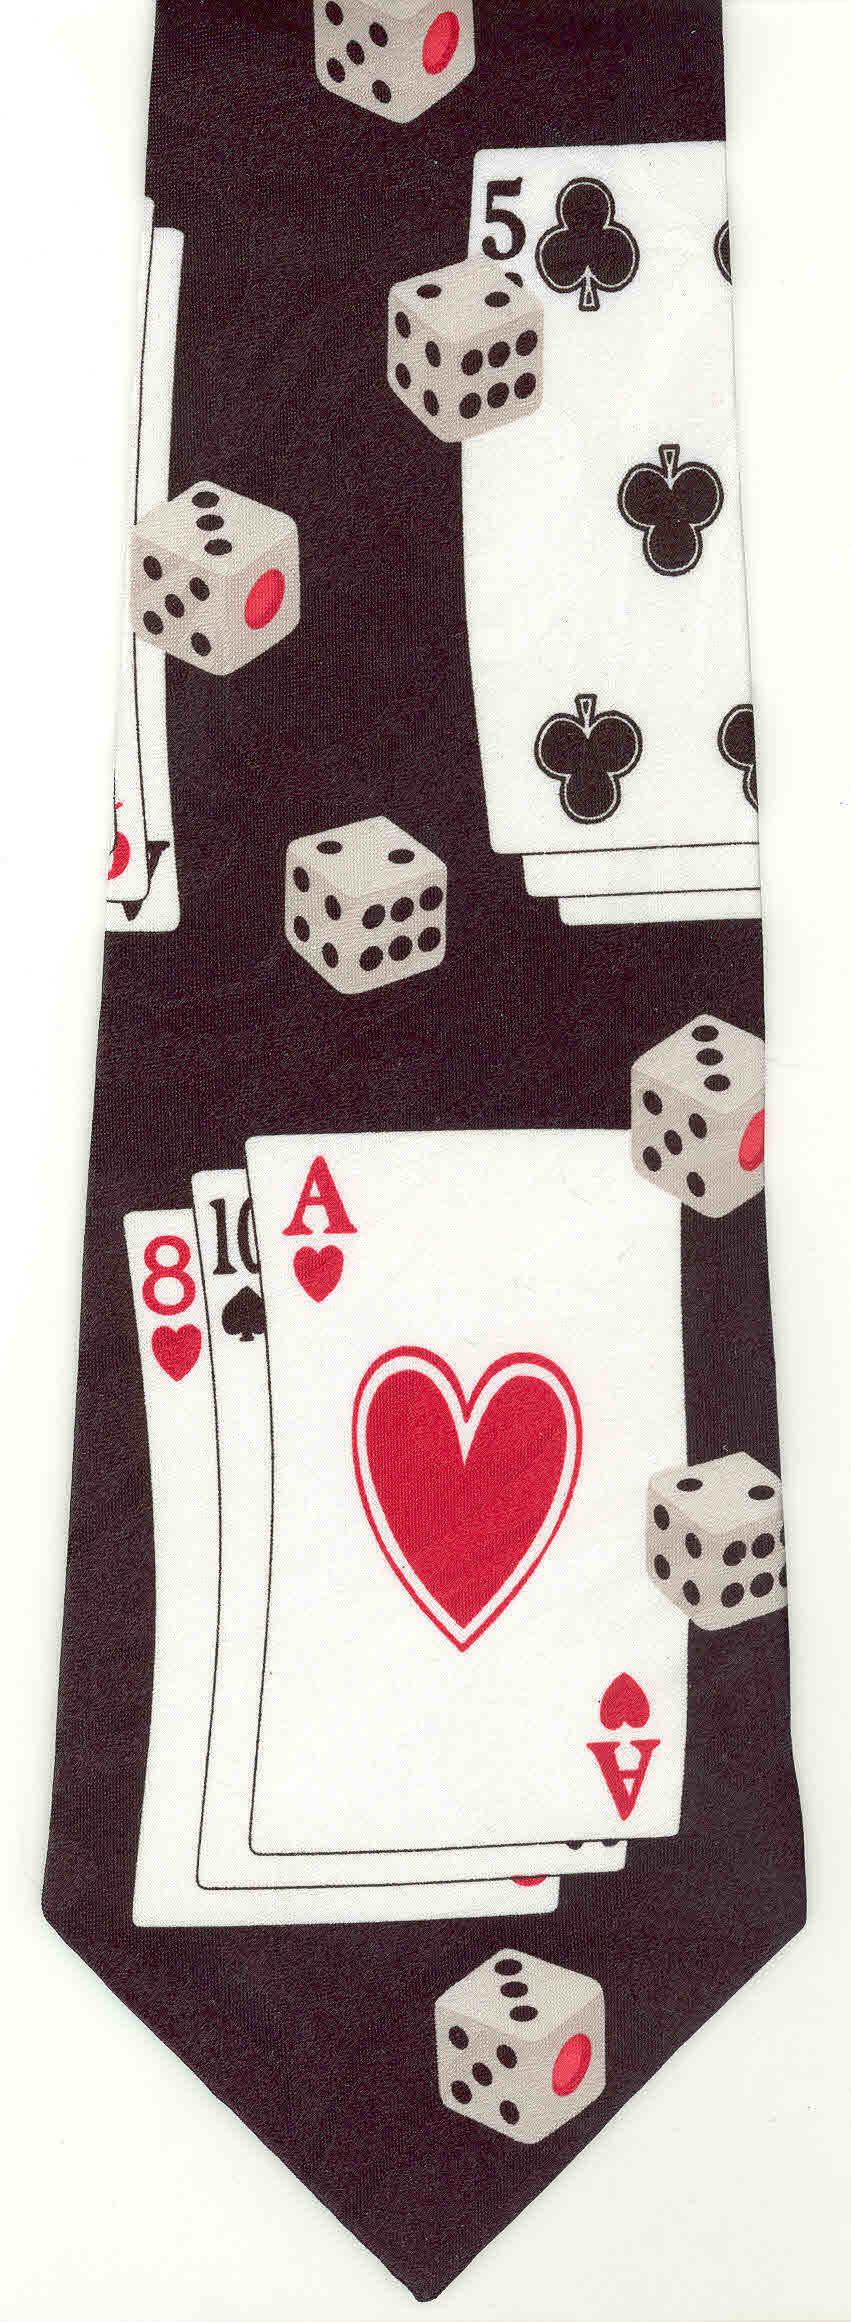 036 Ace Hearts & Dice.jpg